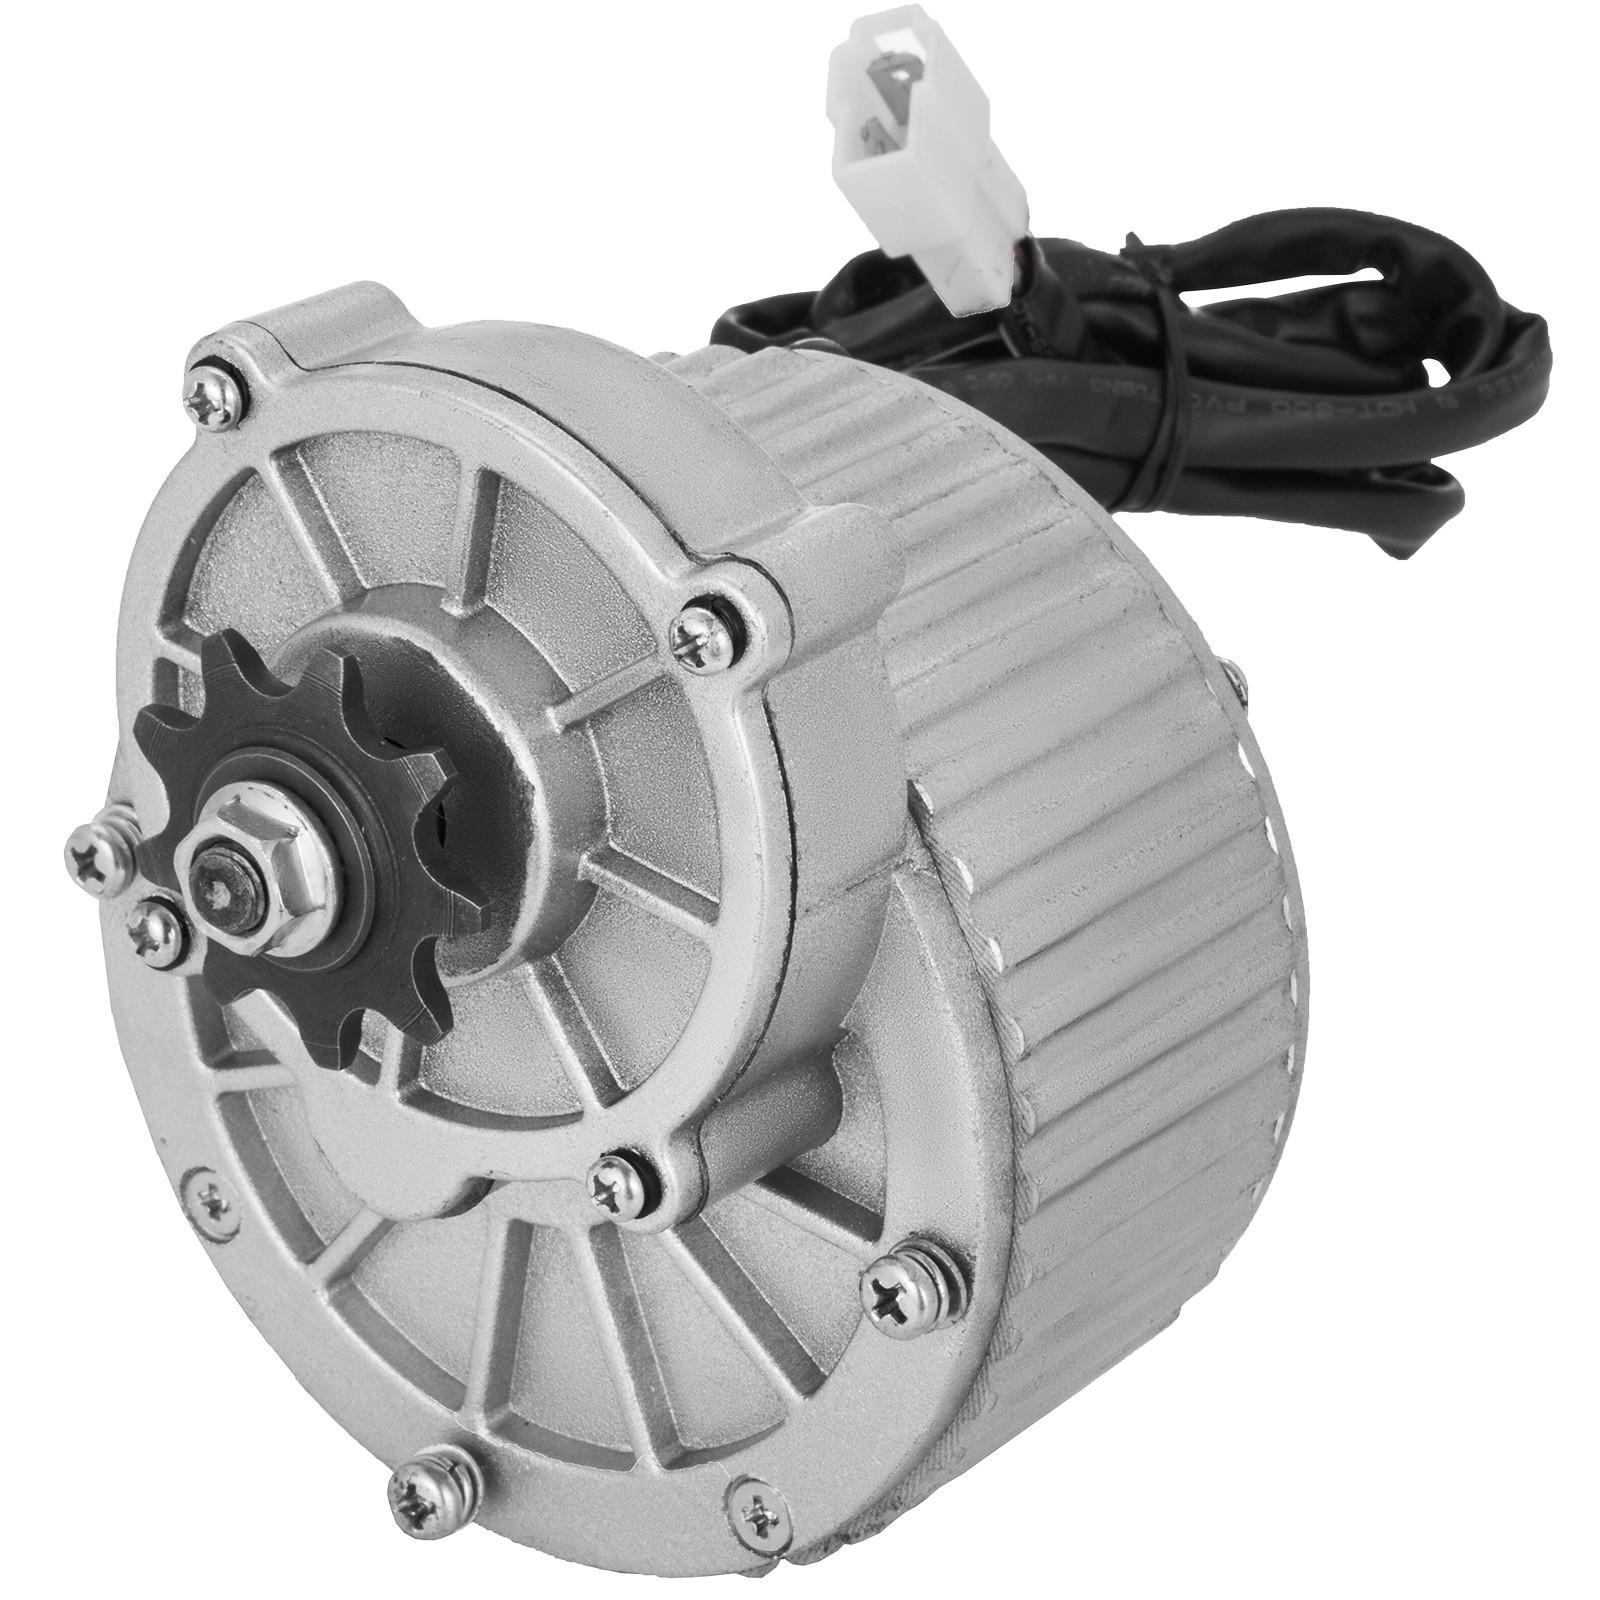 24V-500W-3500RPM-Electric-Motor-f-scooter-bike-go-kart-minibike-MY1016 thumbnail 65